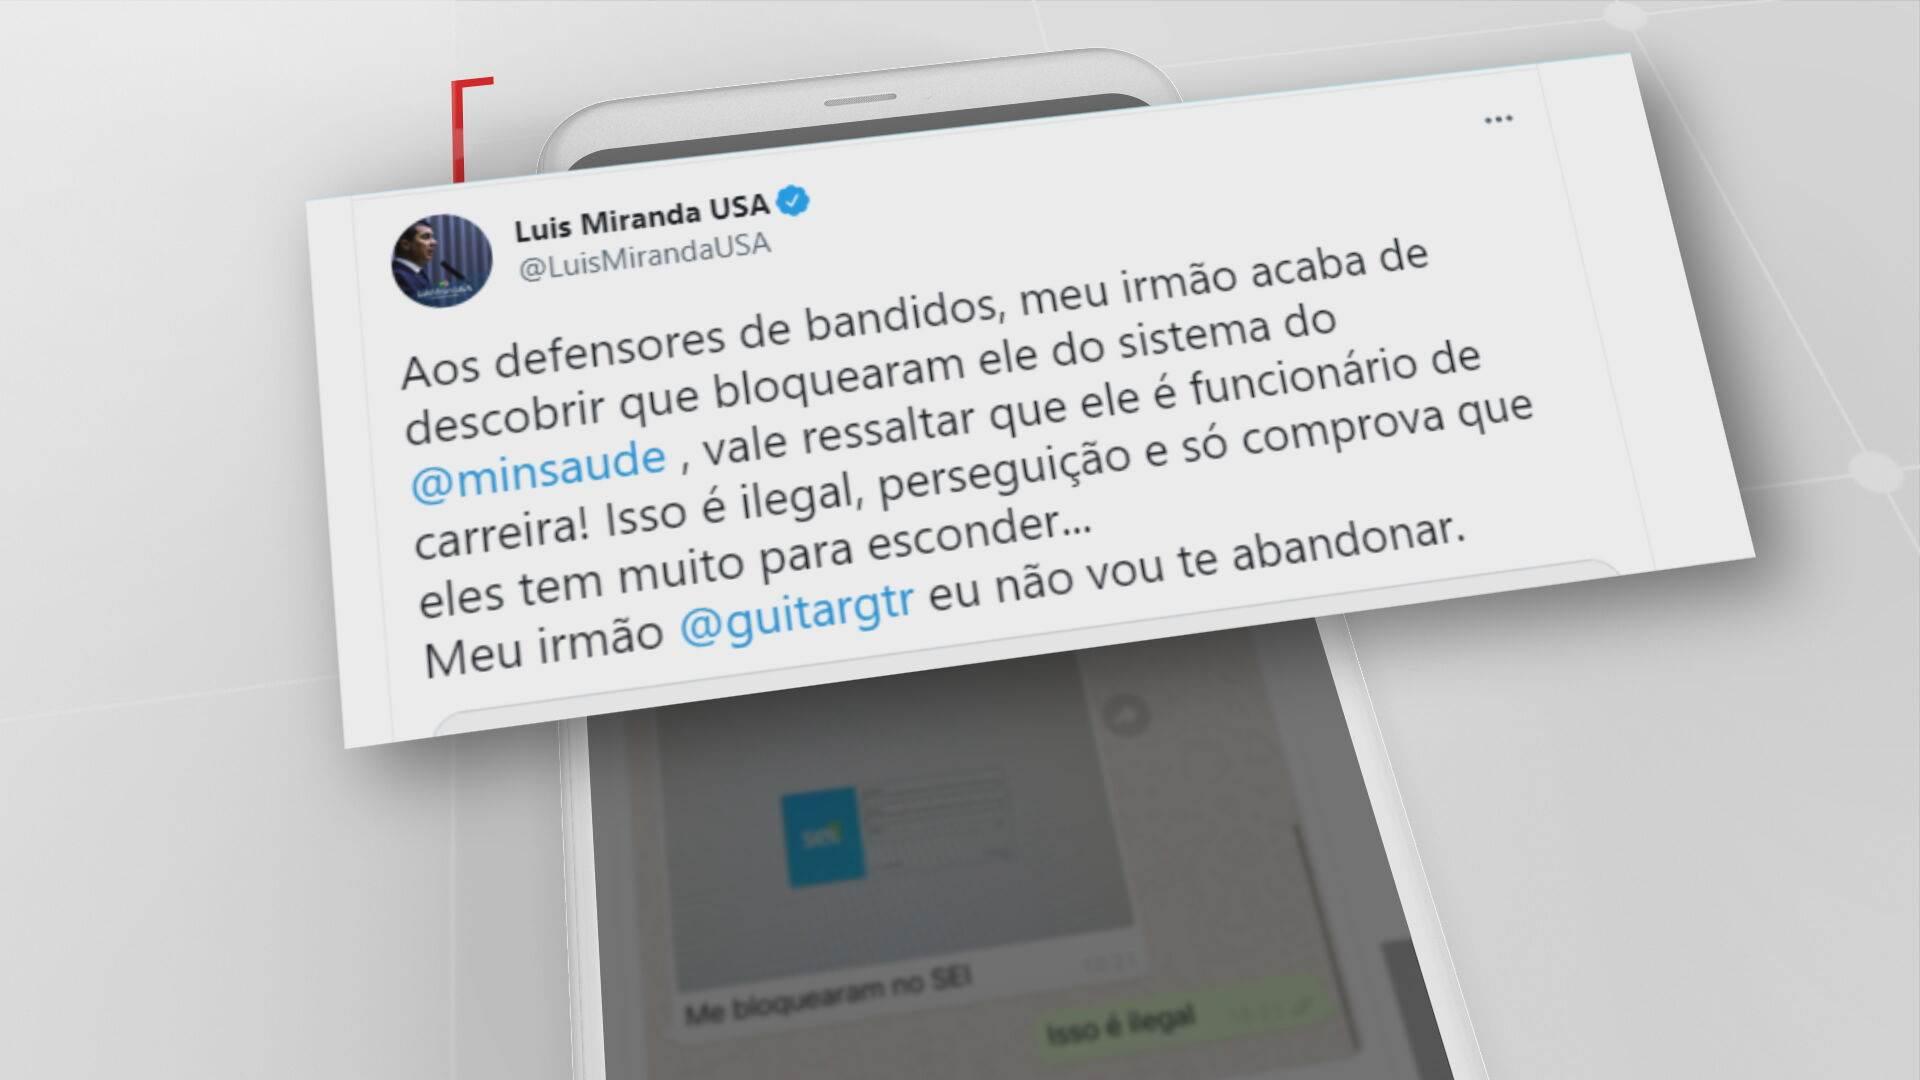 Tweet do Deputado Federal Luis Miranda (DEM)